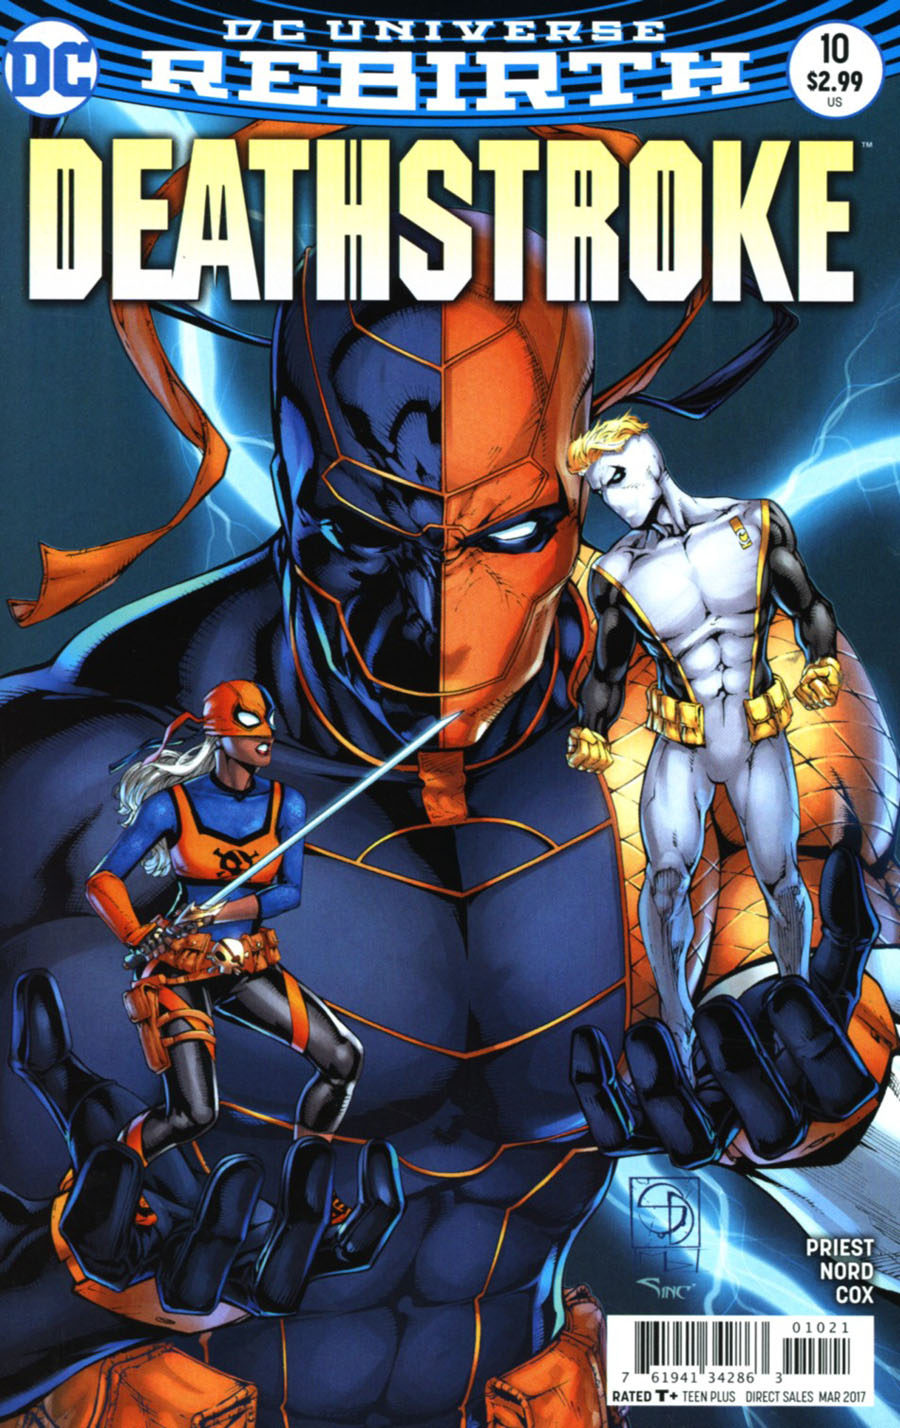 Deathstroke Vol 4 #10 Cover B Variant Shane Davis Cover